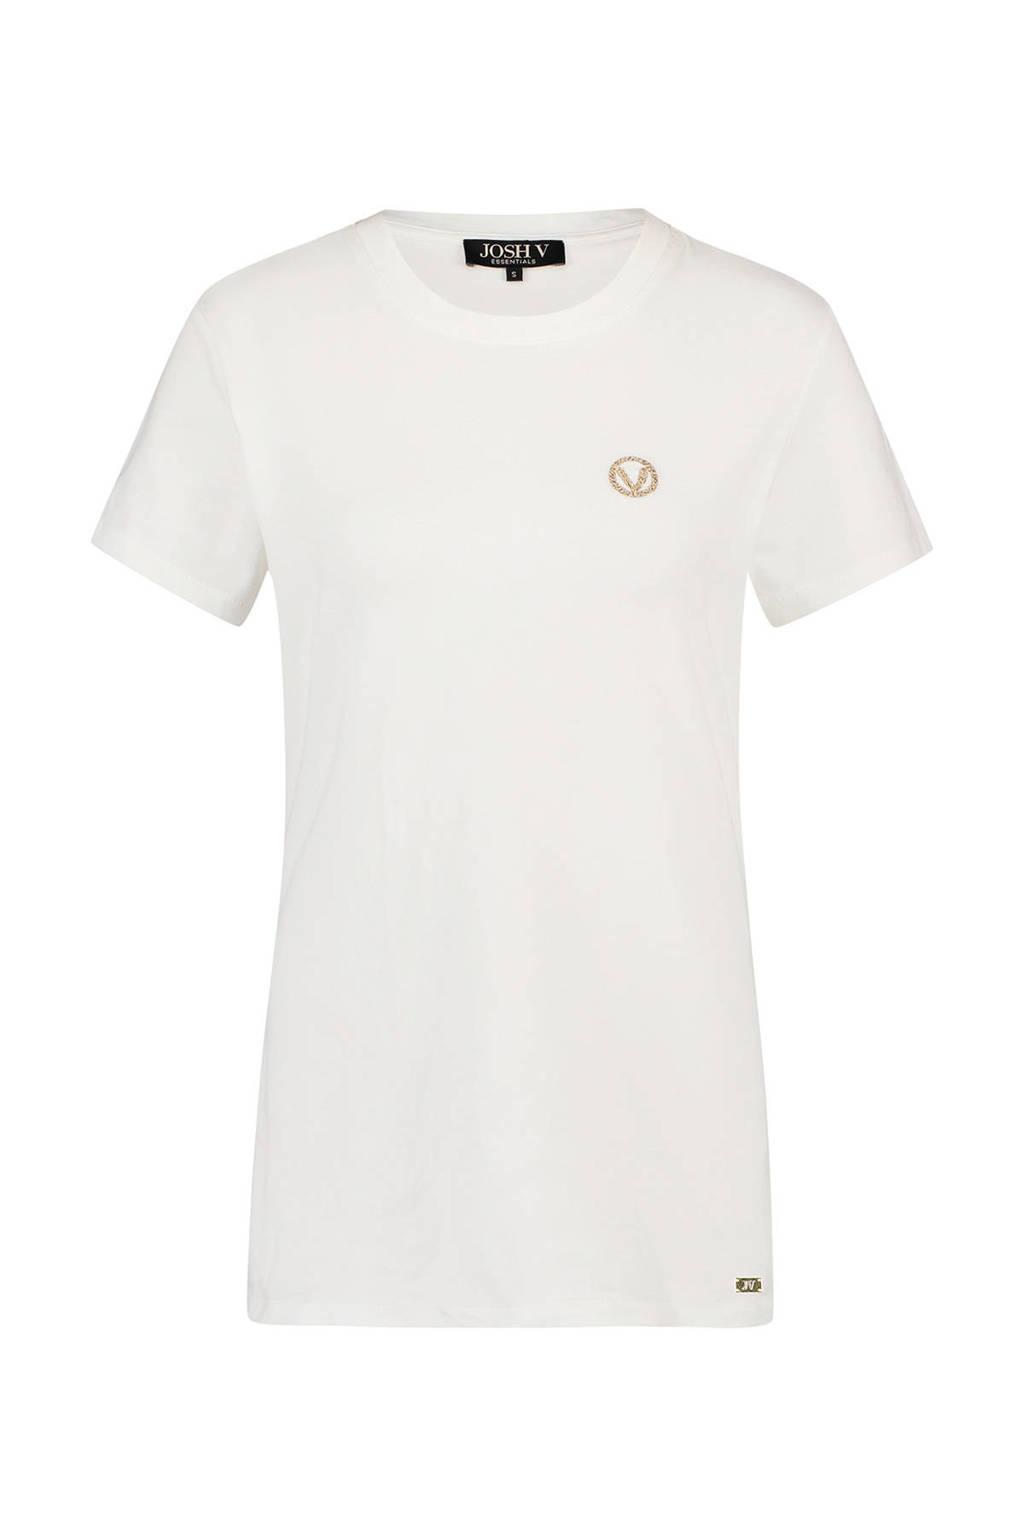 JOSH V T-shirt ZOE wit, Wit